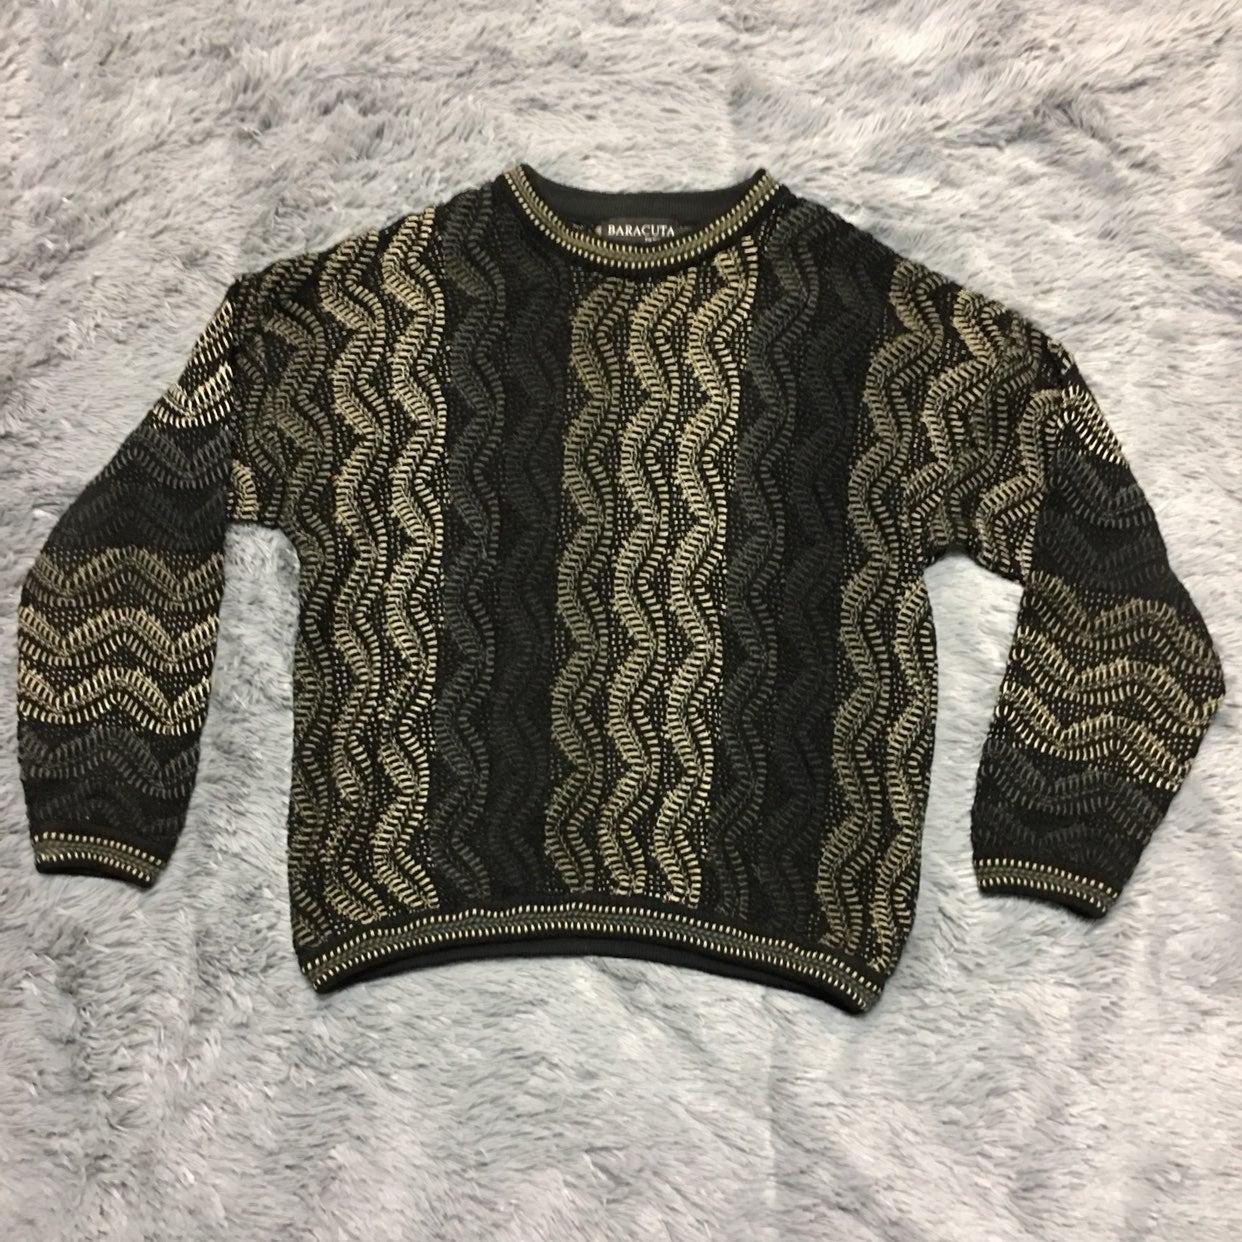 Baracuta By Tundra Crewneck Sweater